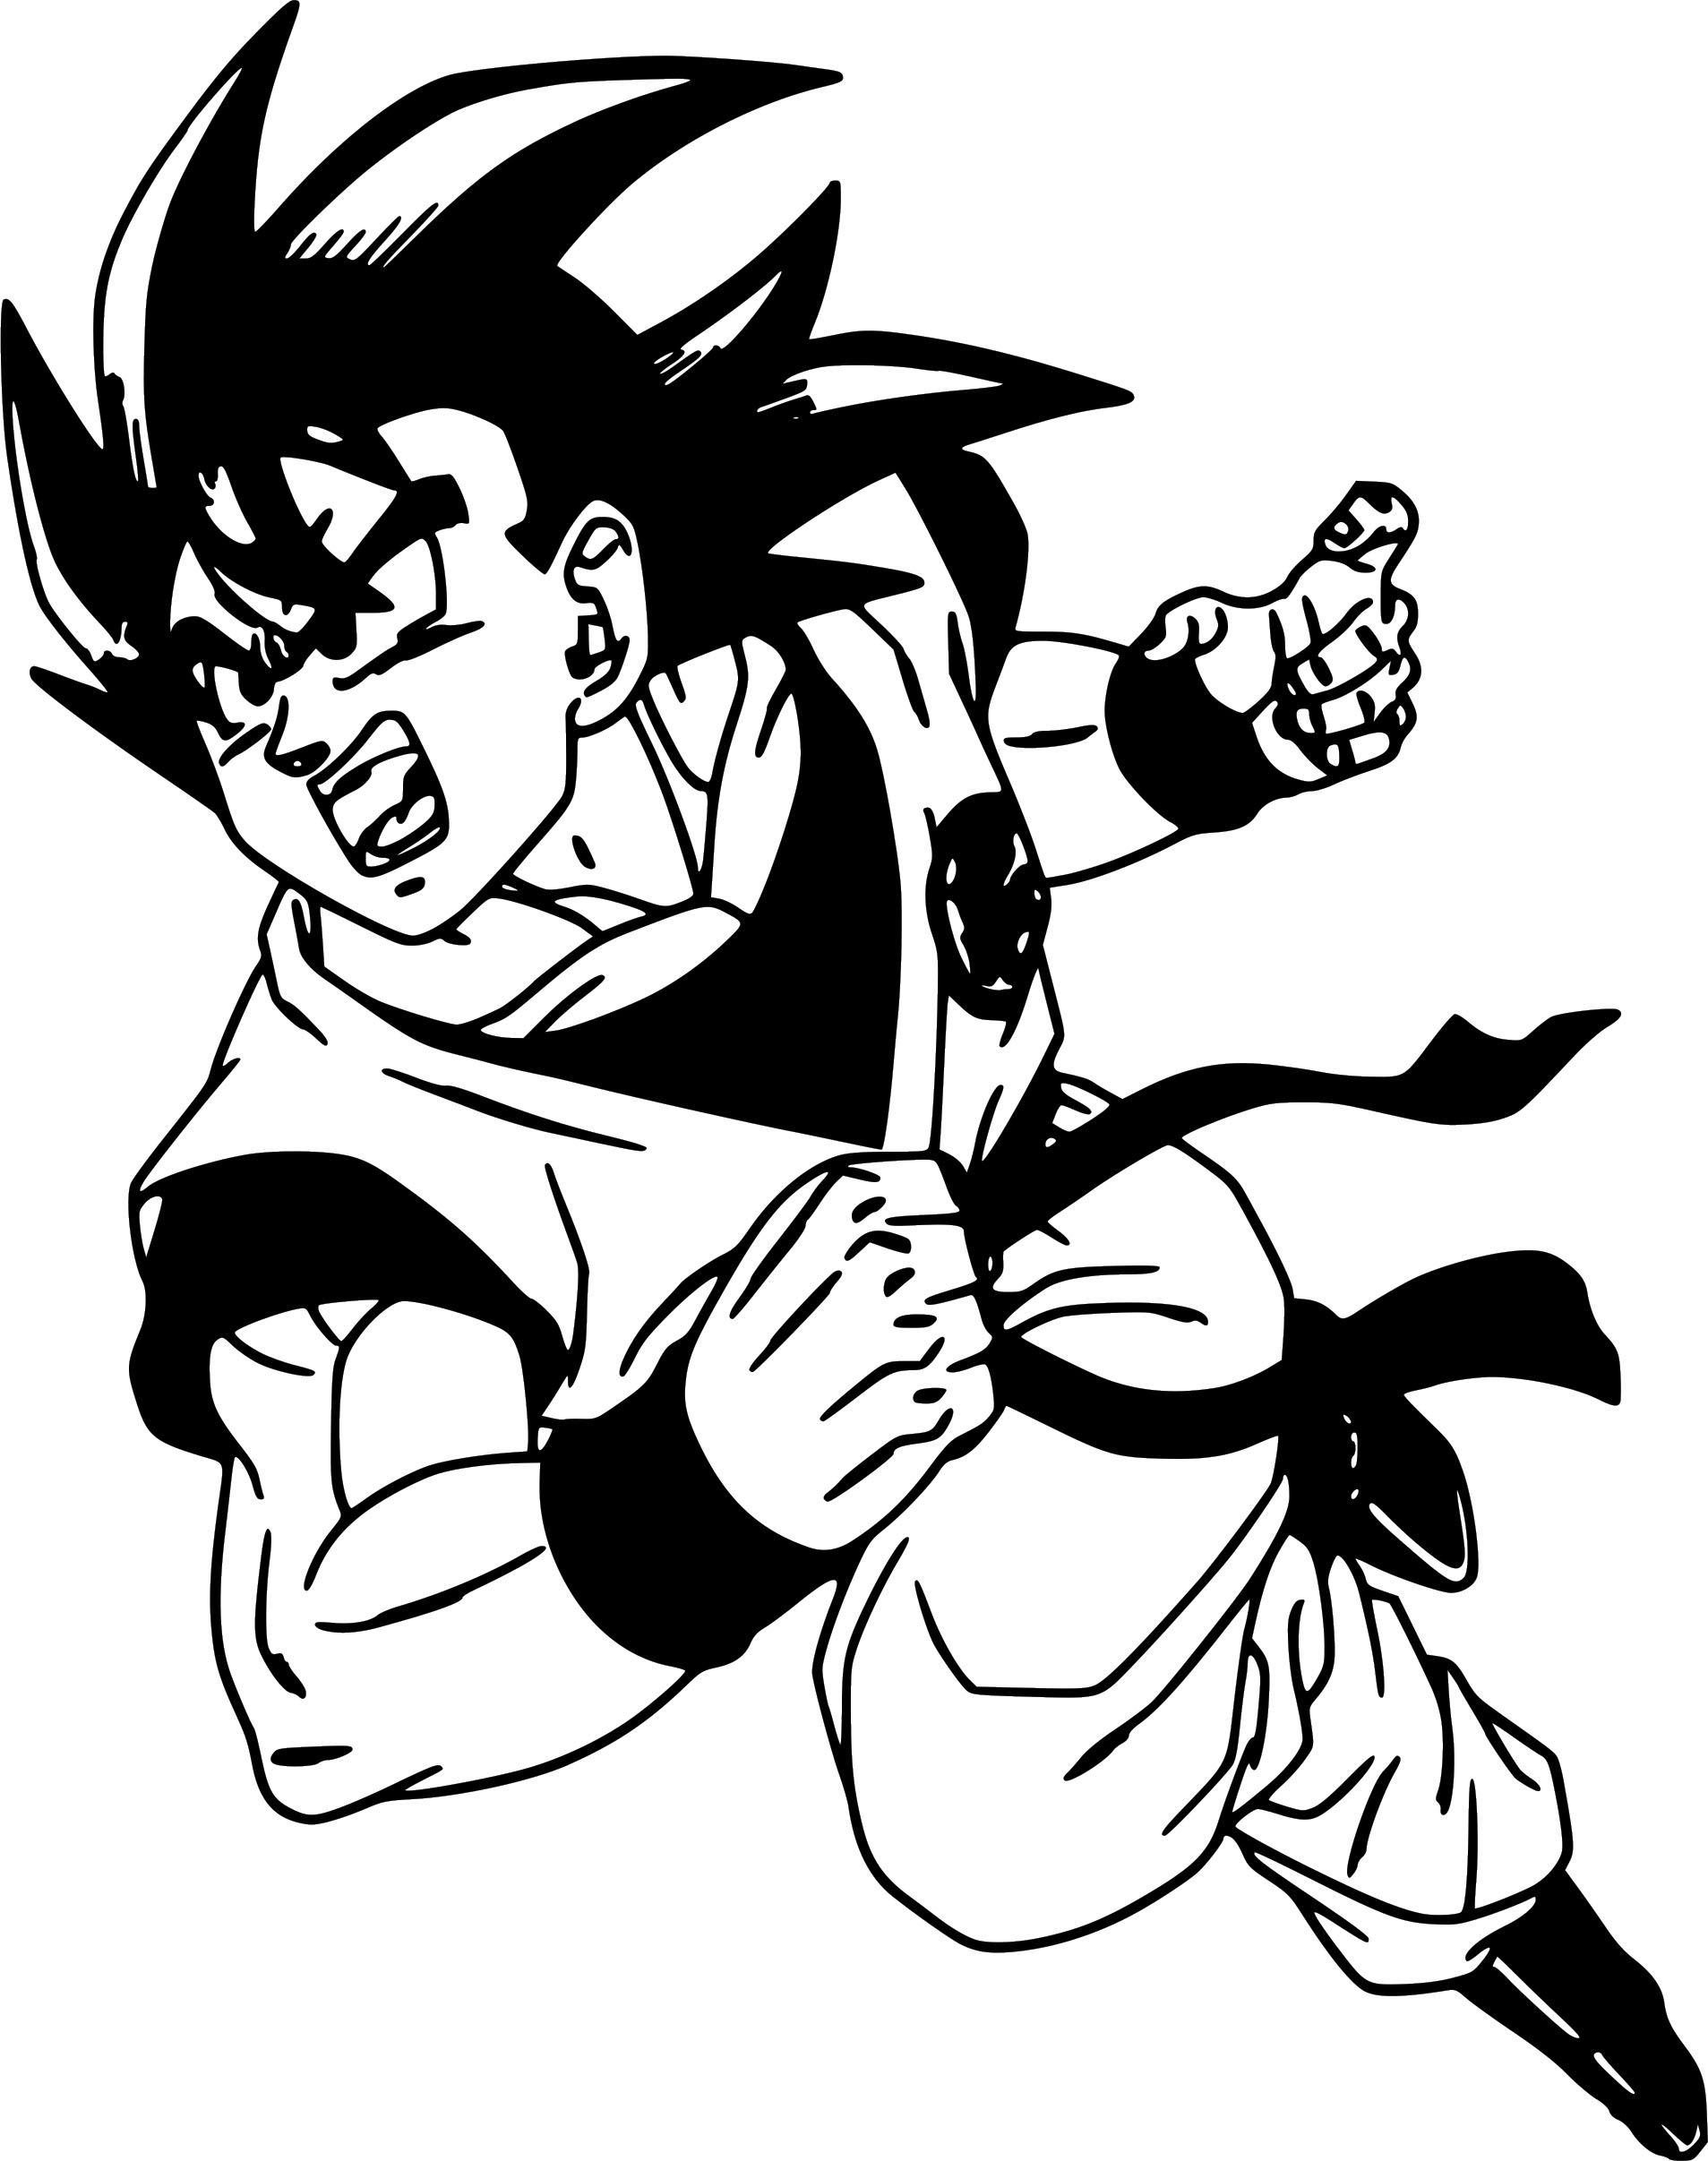 Goku Dragon Ball Z Vinyl Sticker Decal Goku decal